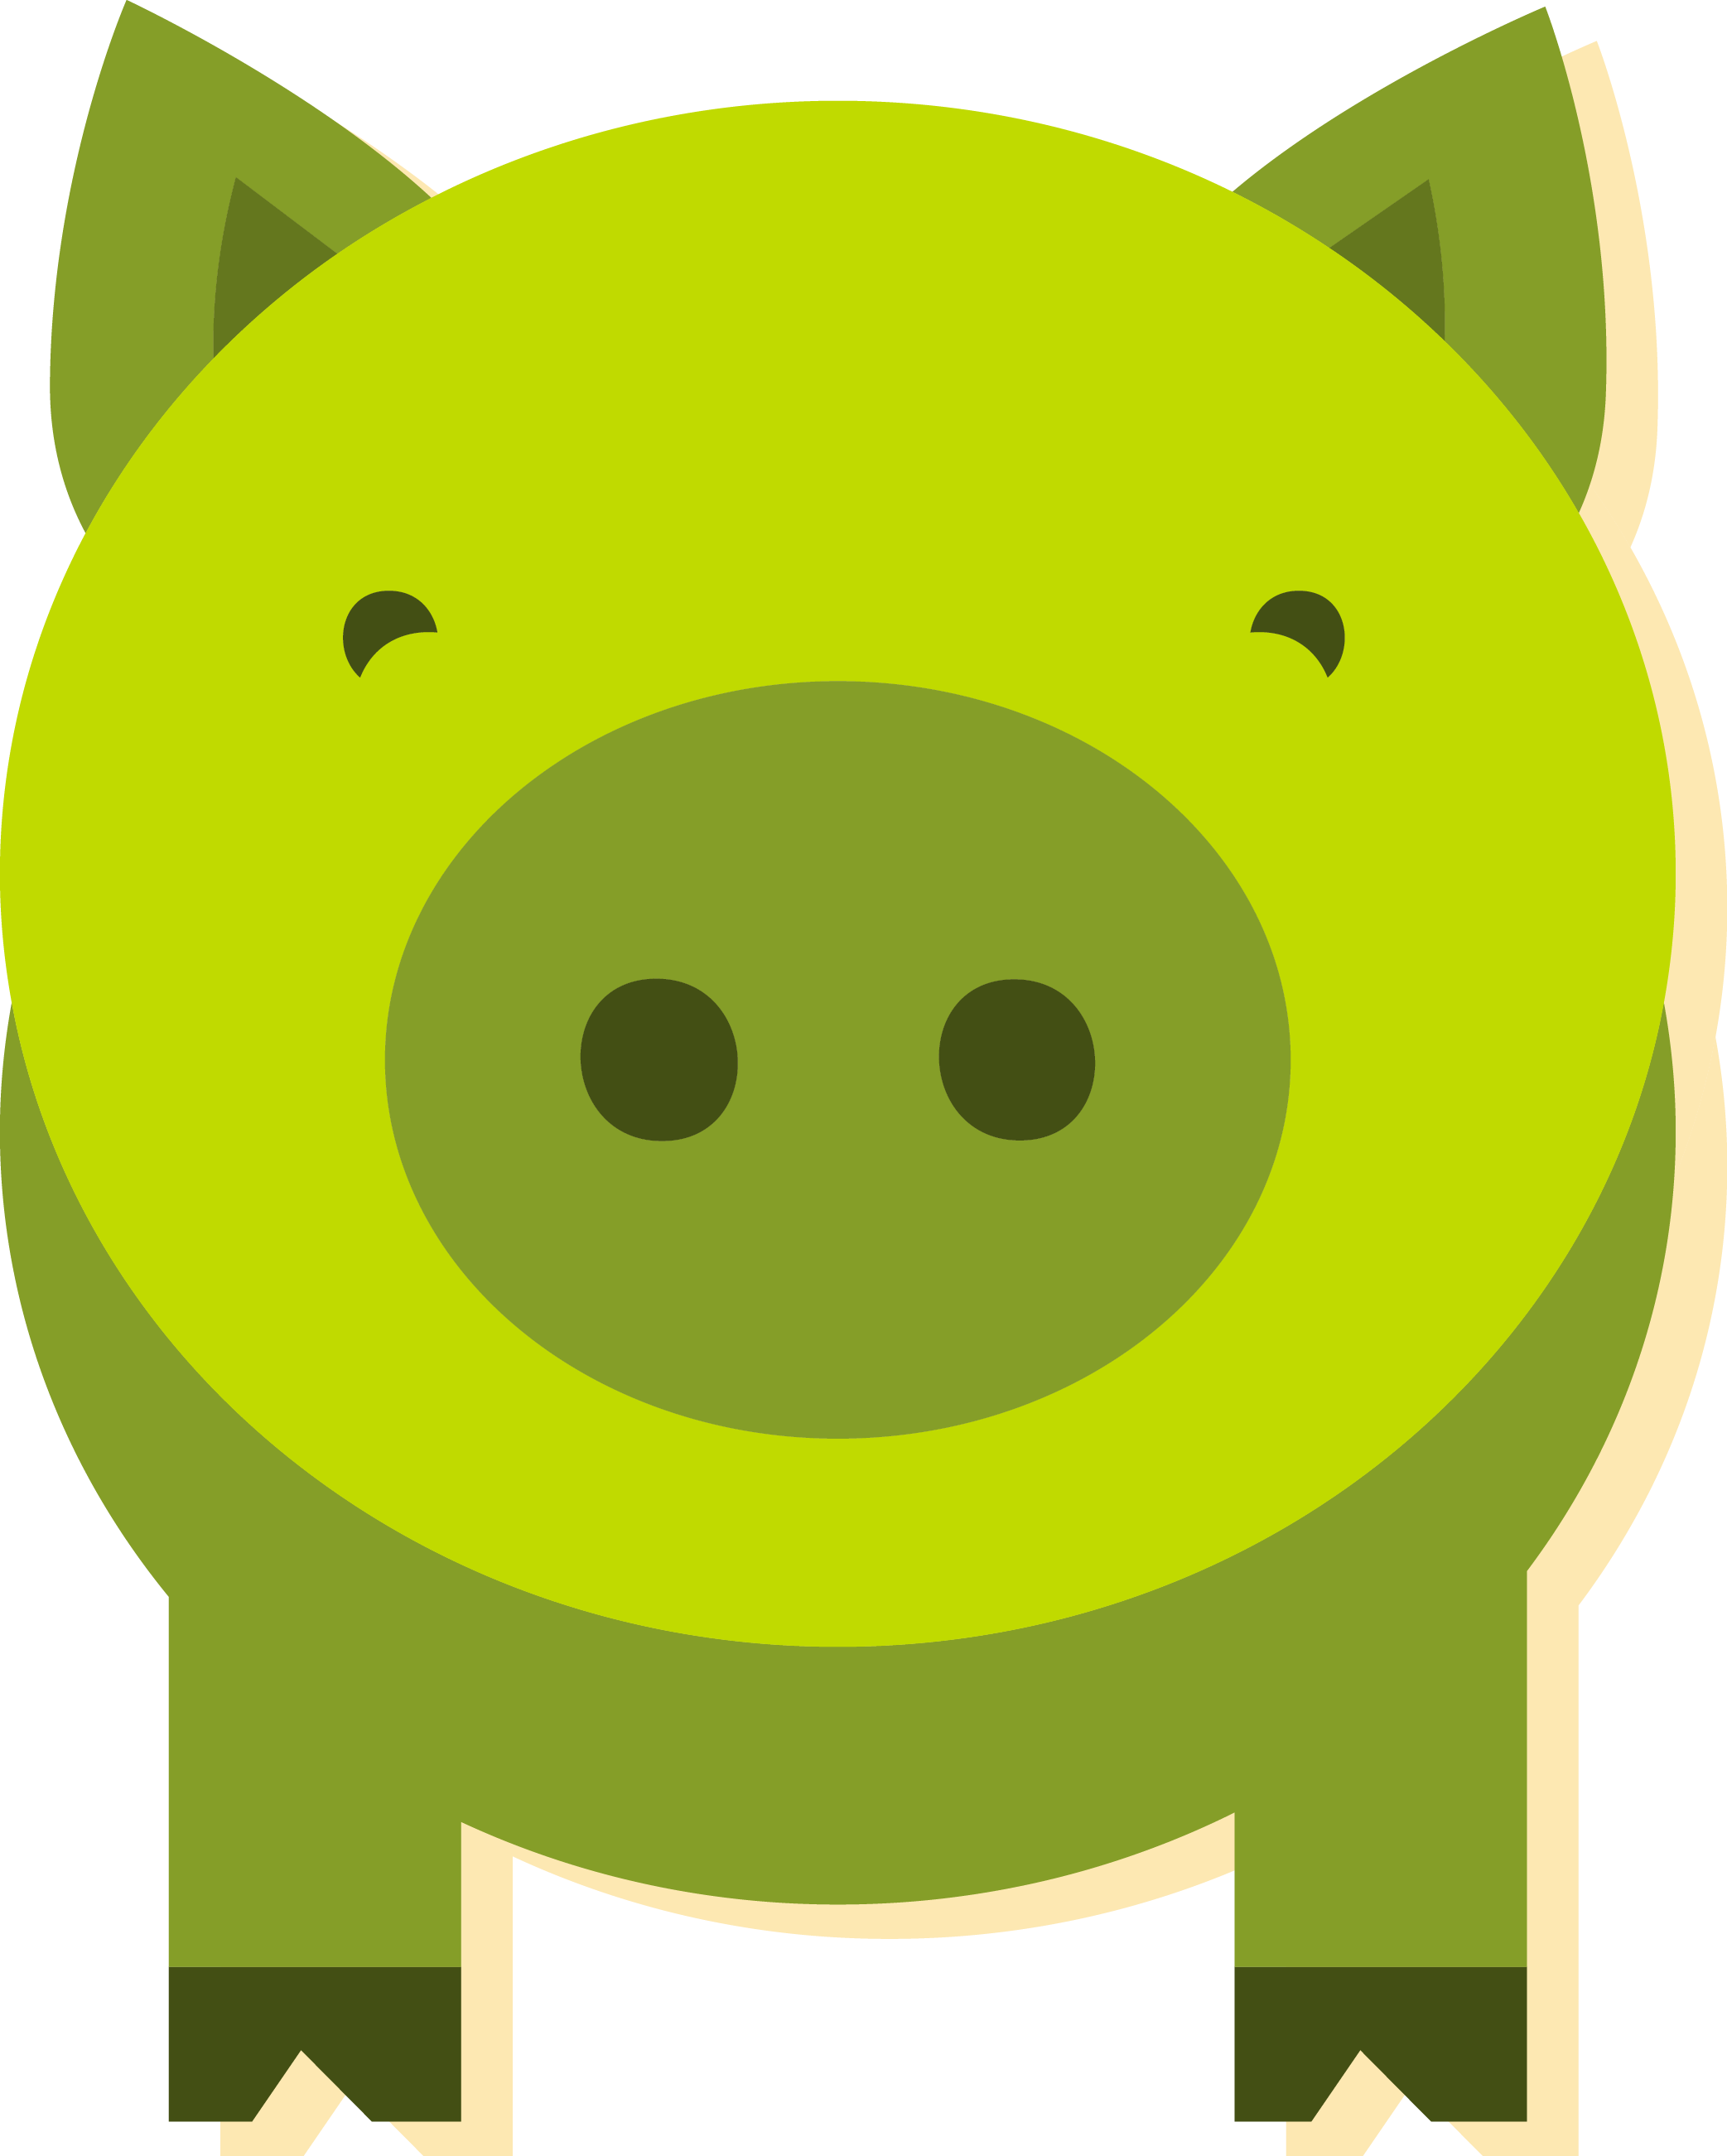 Green piggy bank clipart clipart royalty free library Domestic pig Green Clip art - Green piggy bank 2085*2603 transprent ... clipart royalty free library